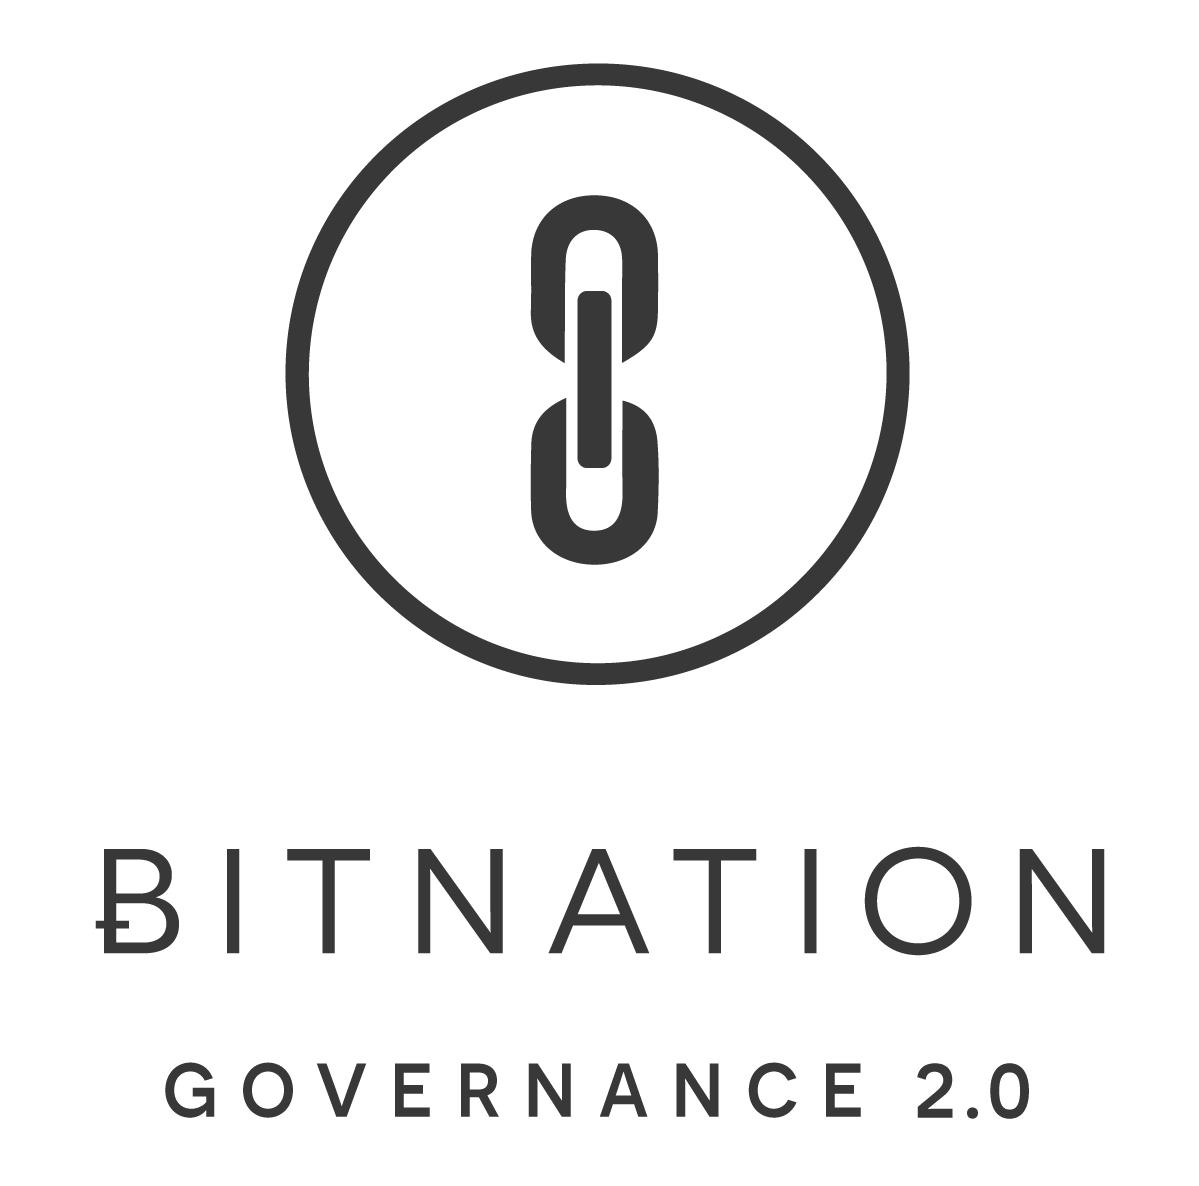 Bitnation logo square black